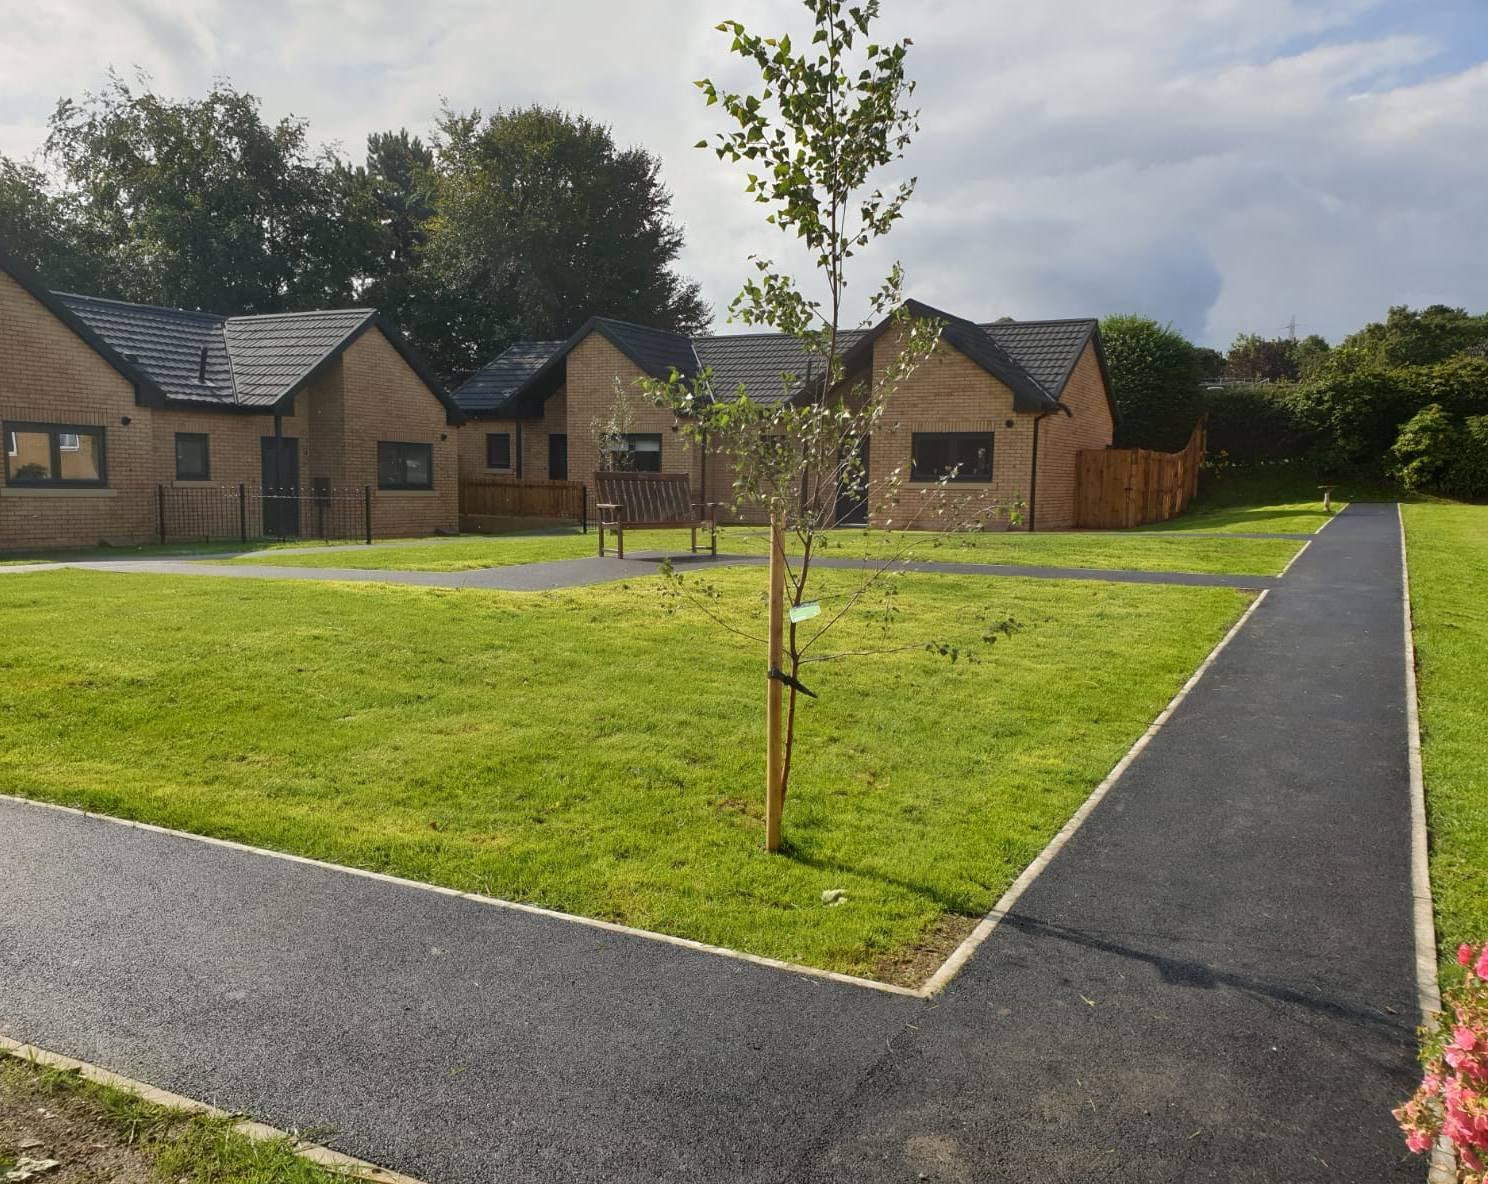 Ward Court housing development in Brighouse